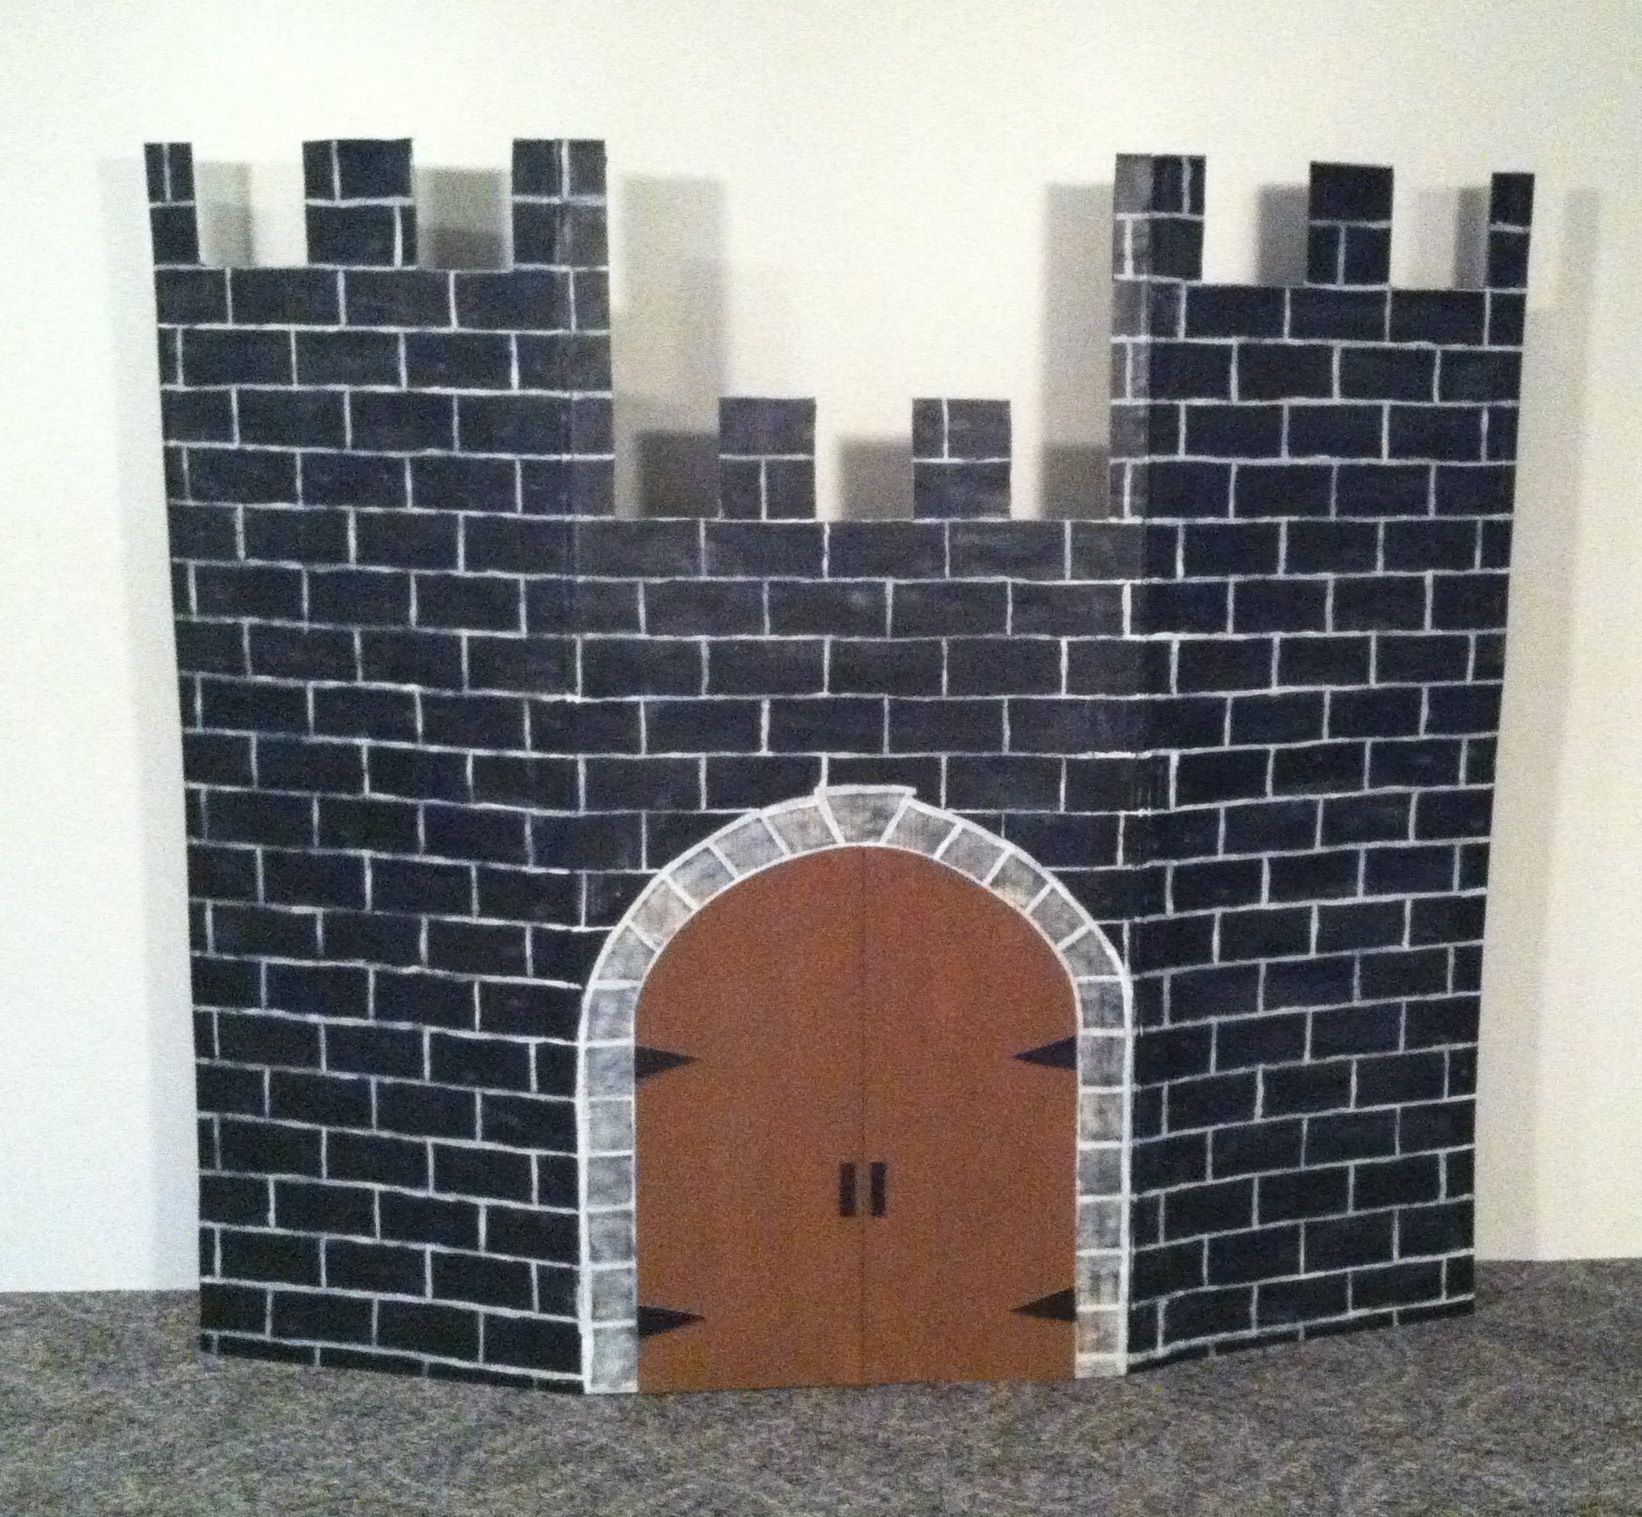 5 u0027x6 u0027 cardboard castle backdrop library prop 2014 church and